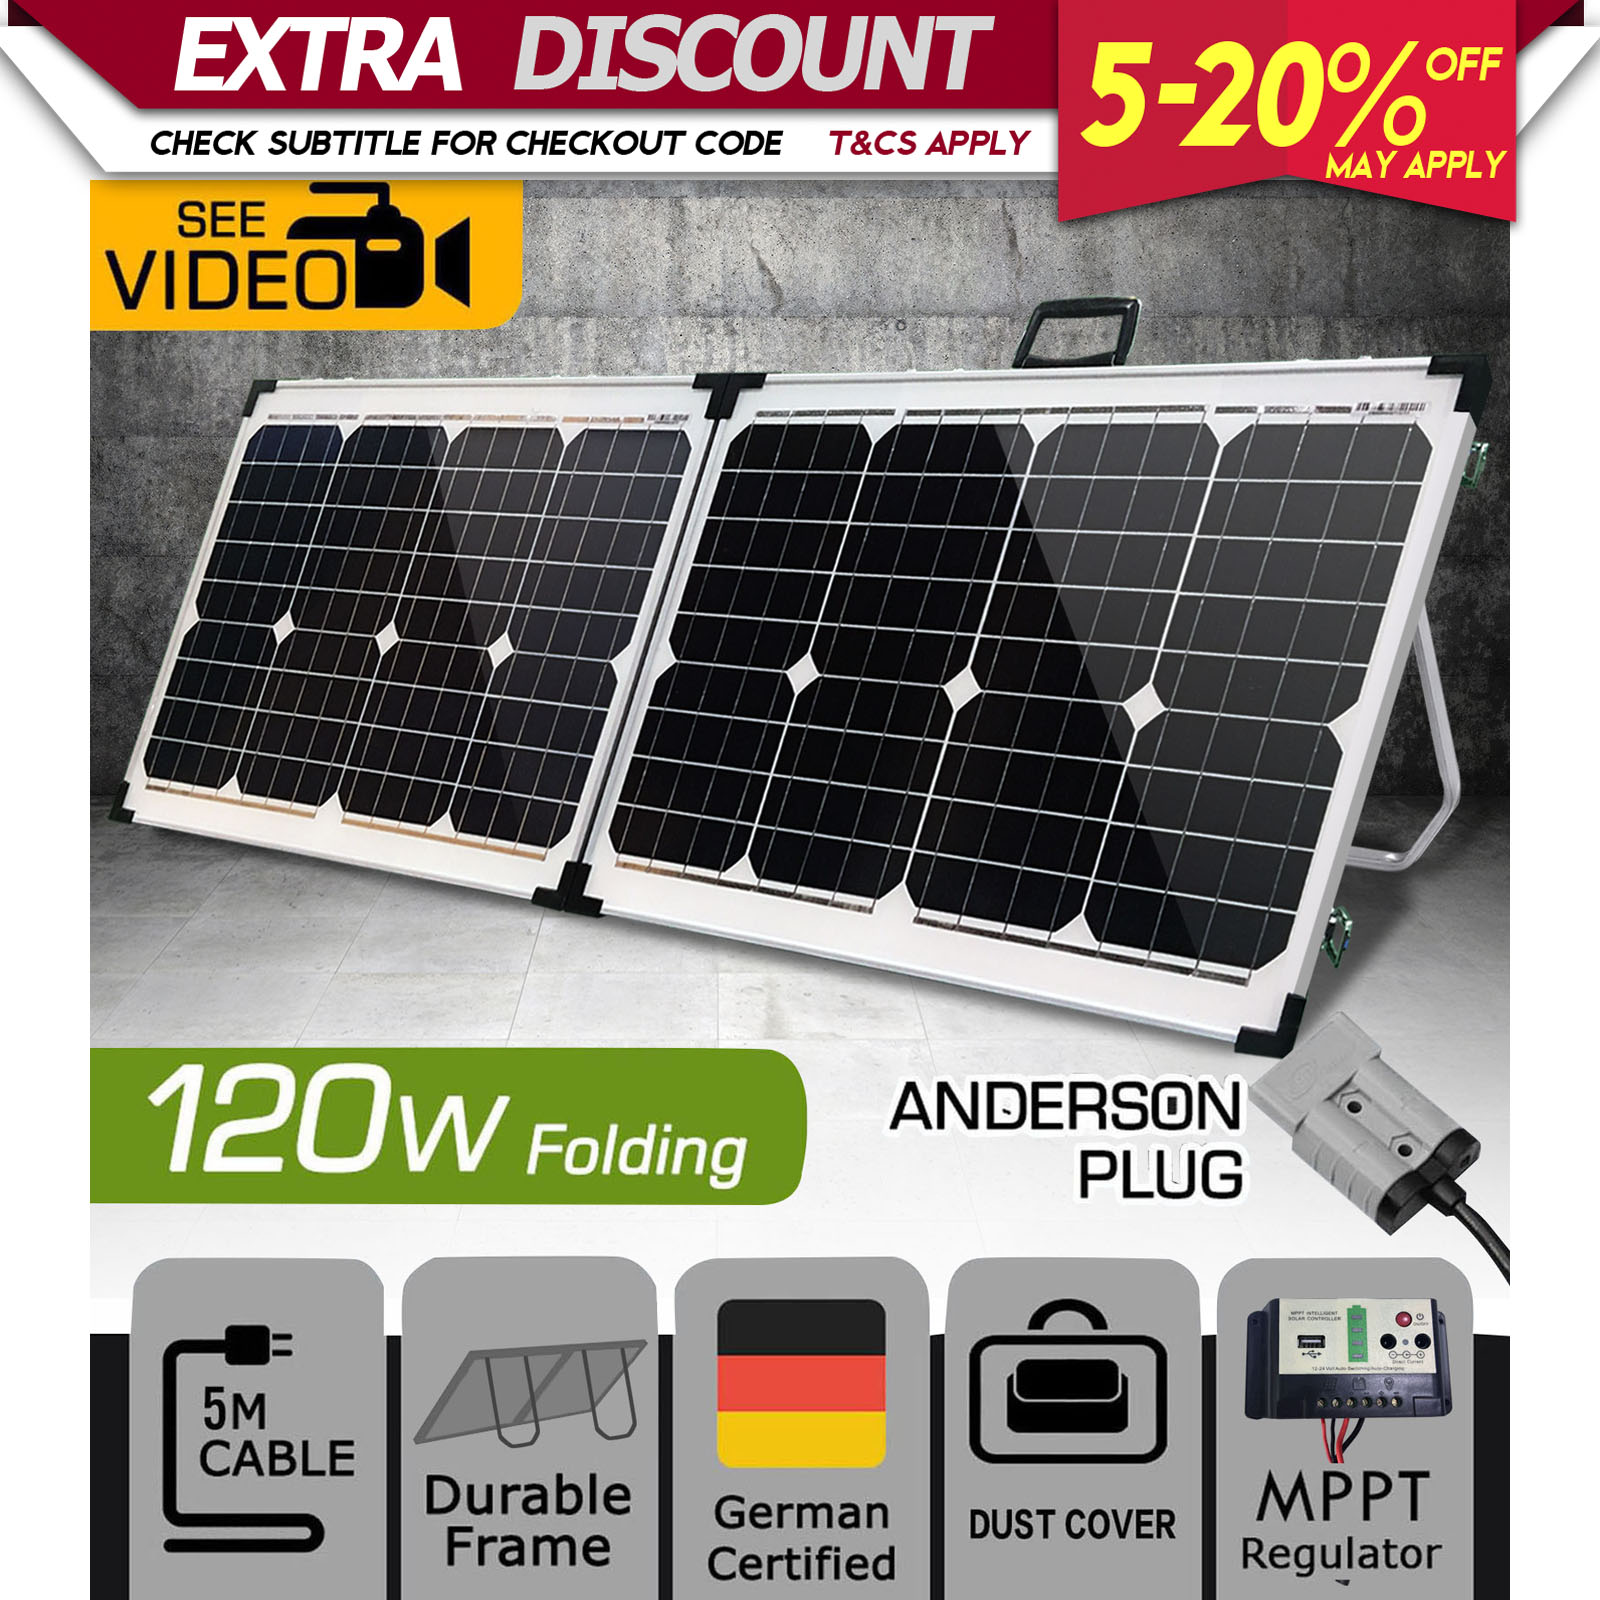 120w 12v folding solar panel kit mono camping power source. Black Bedroom Furniture Sets. Home Design Ideas